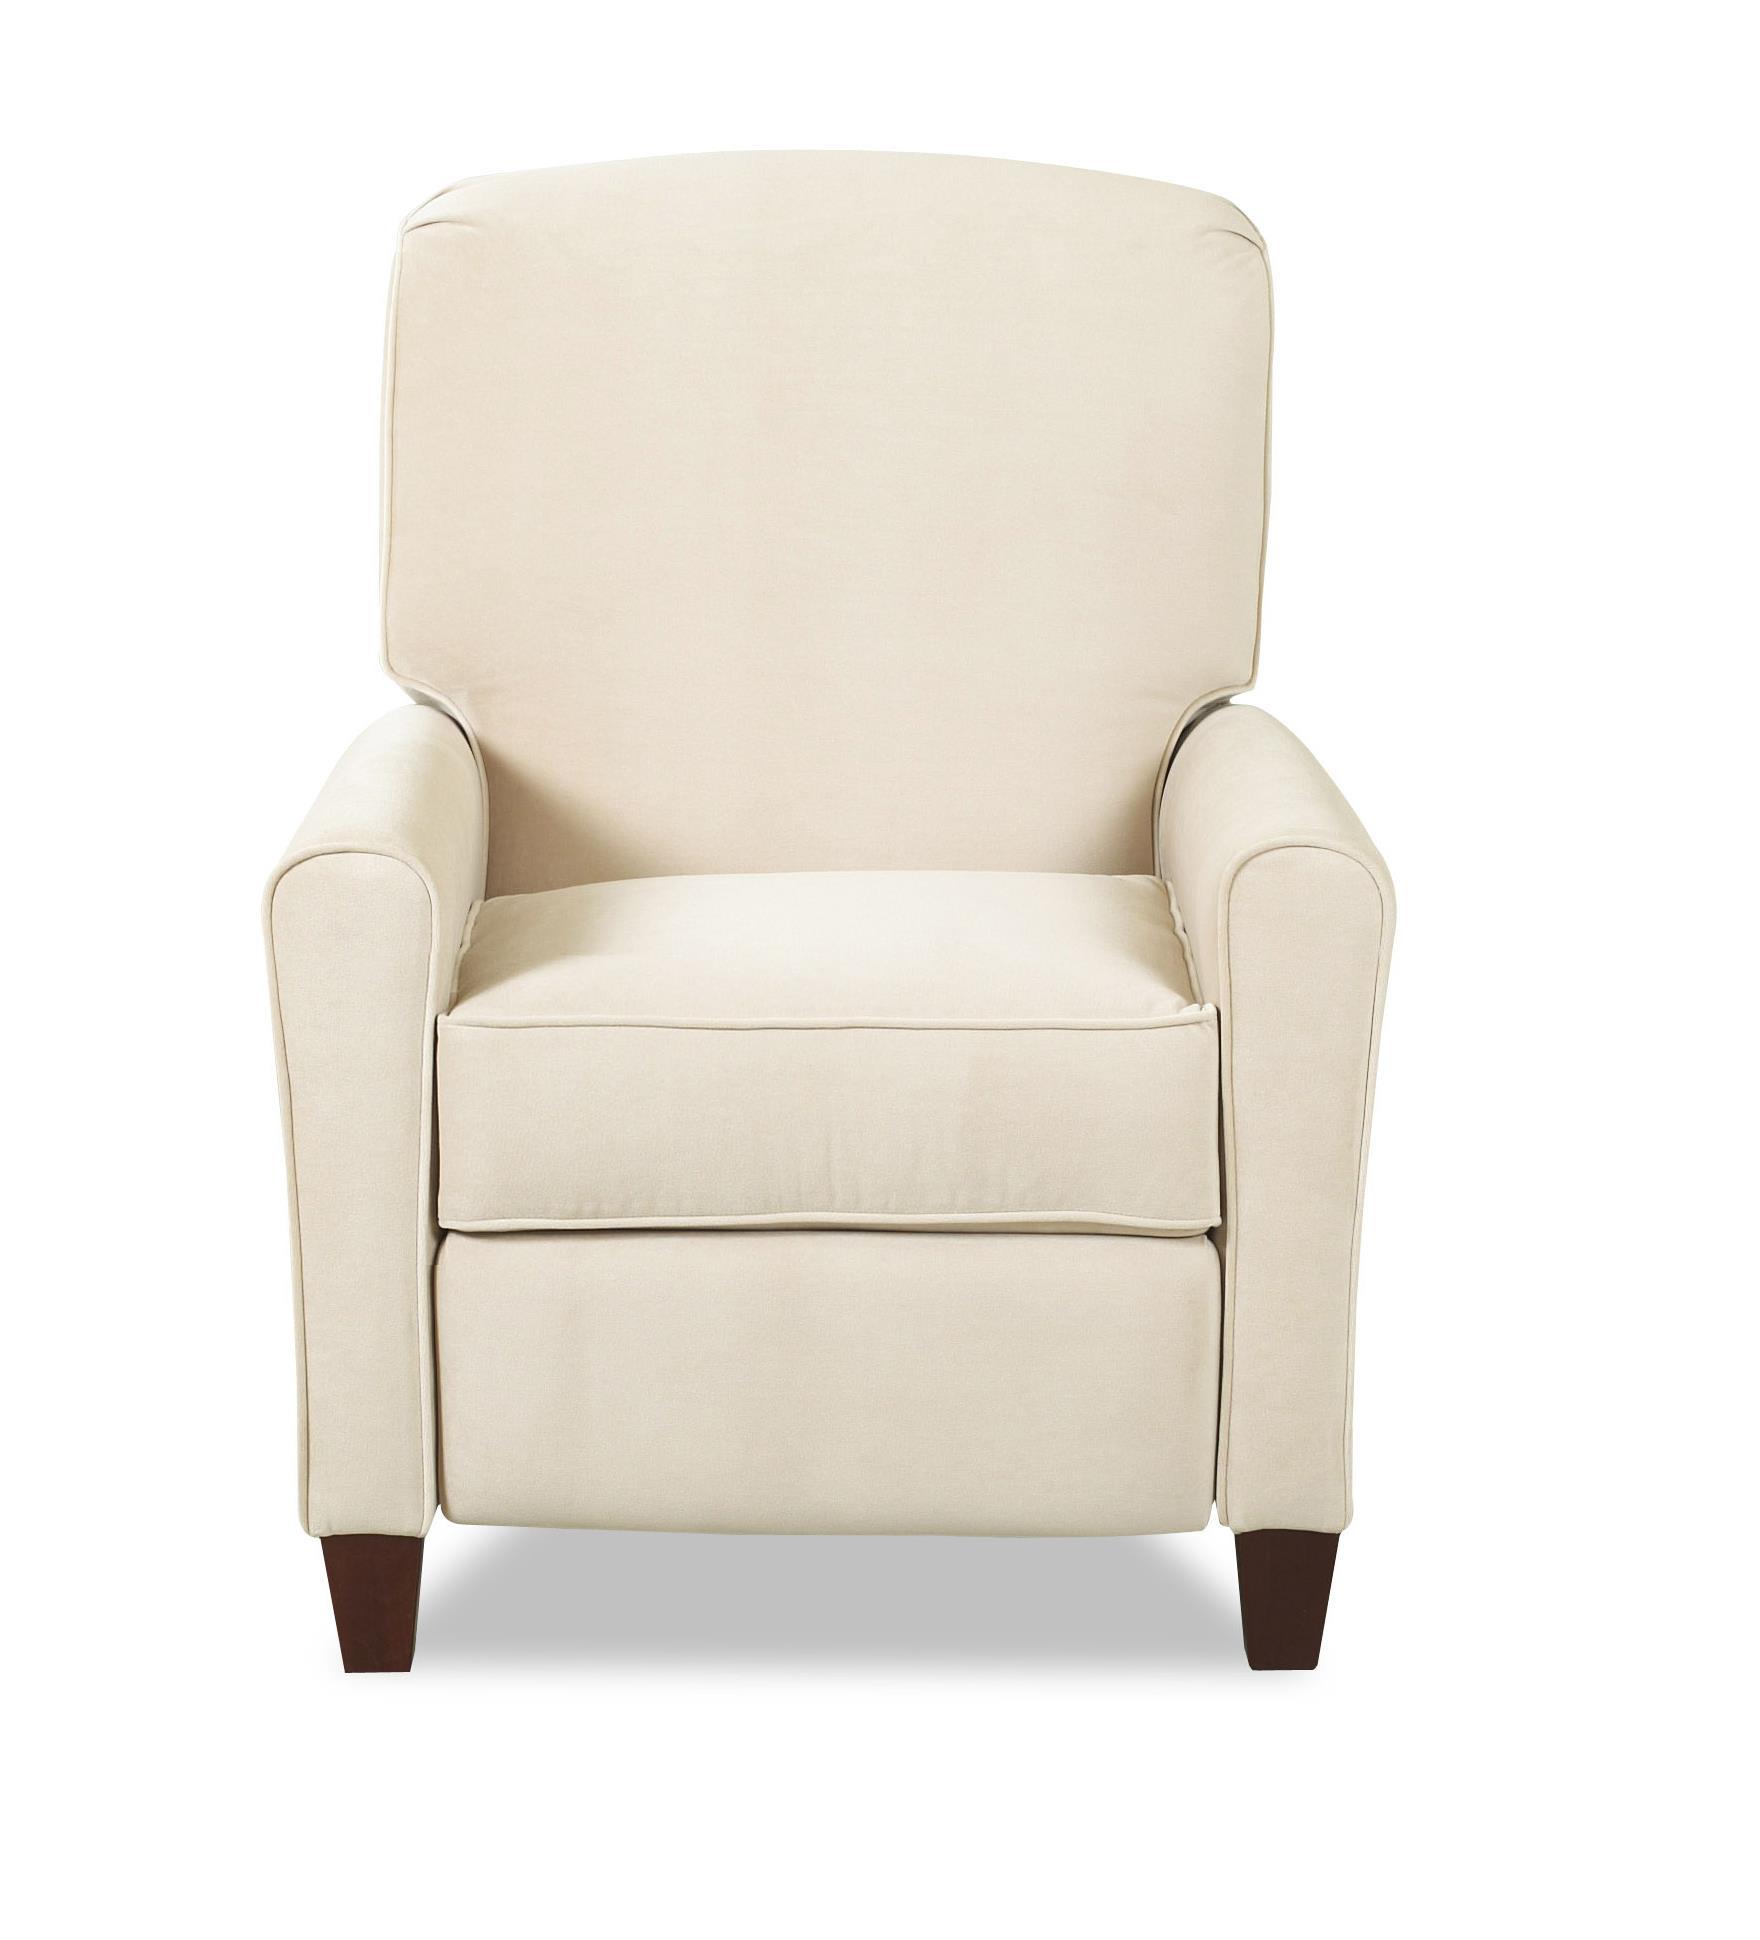 High leg reclining chairs - Klaussner Hybrid High Leg Reclining Chair Item Number 54408 Hlrc